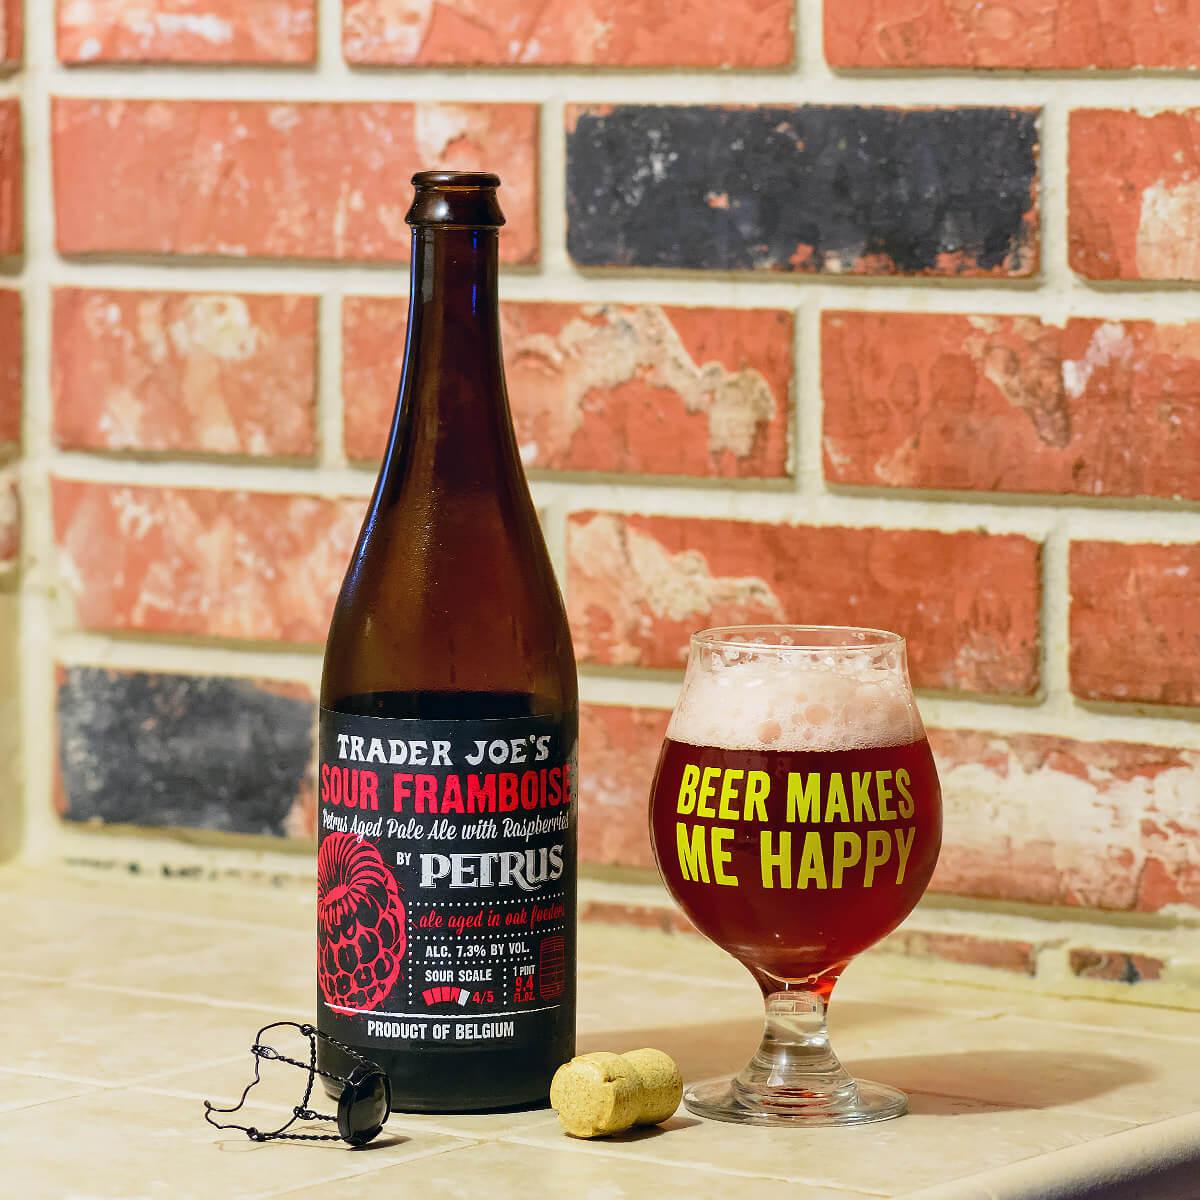 Trader Joe's Sour Framboise, a Belgian Pale Ale by De Brabandere